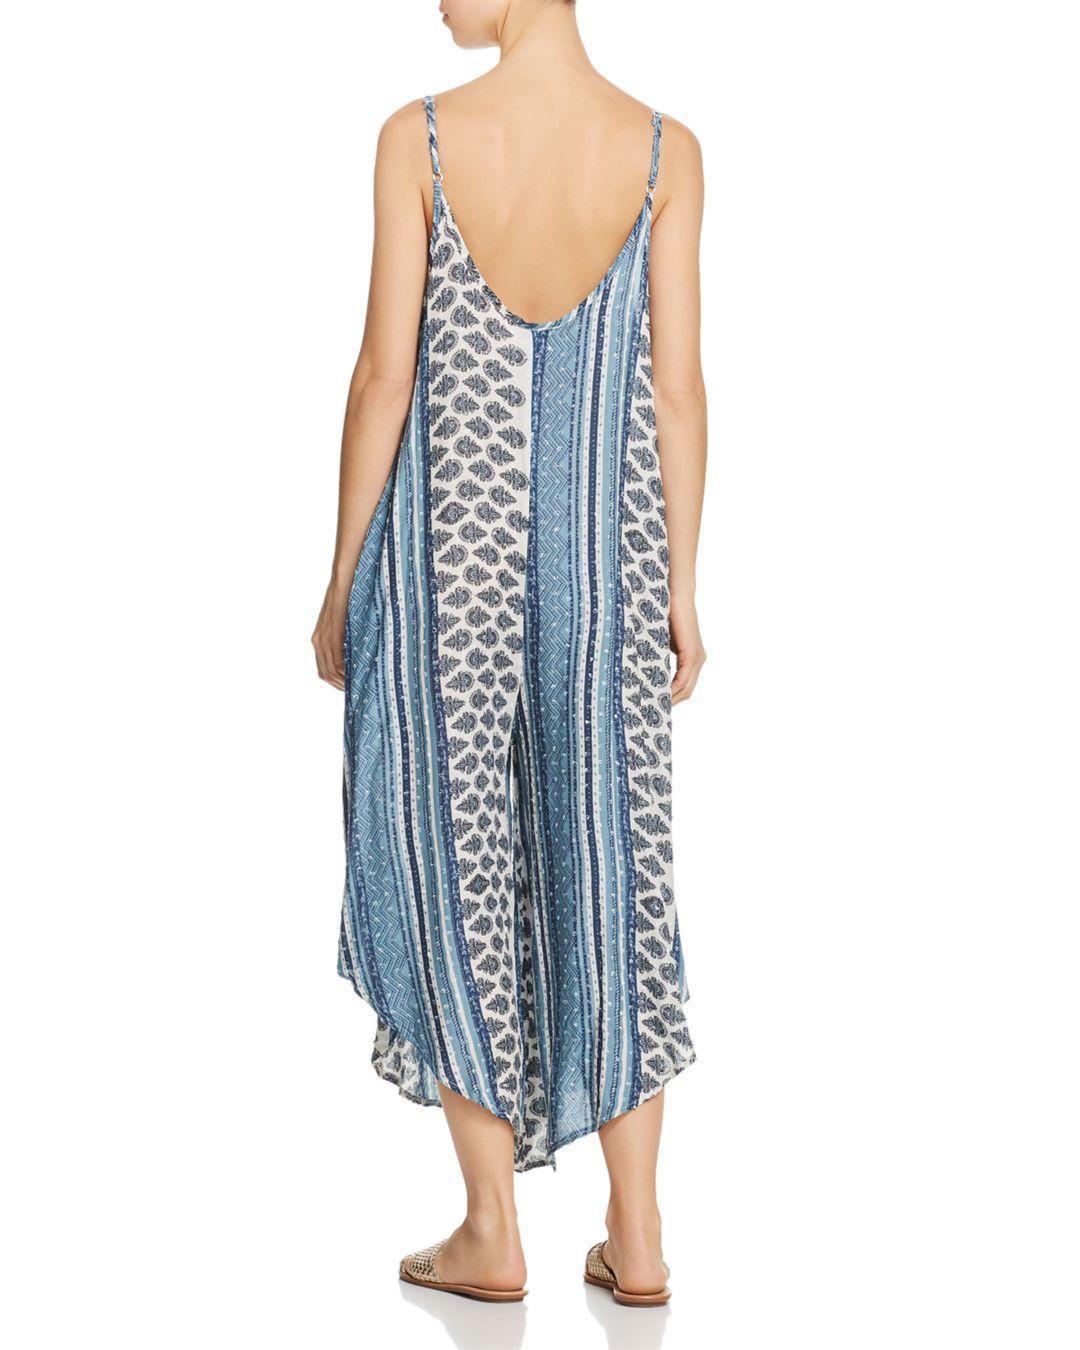 209cb28a71 Lyst - J Valdi Topanga Flowy Jumpsuit Swim Cover-up in Blue